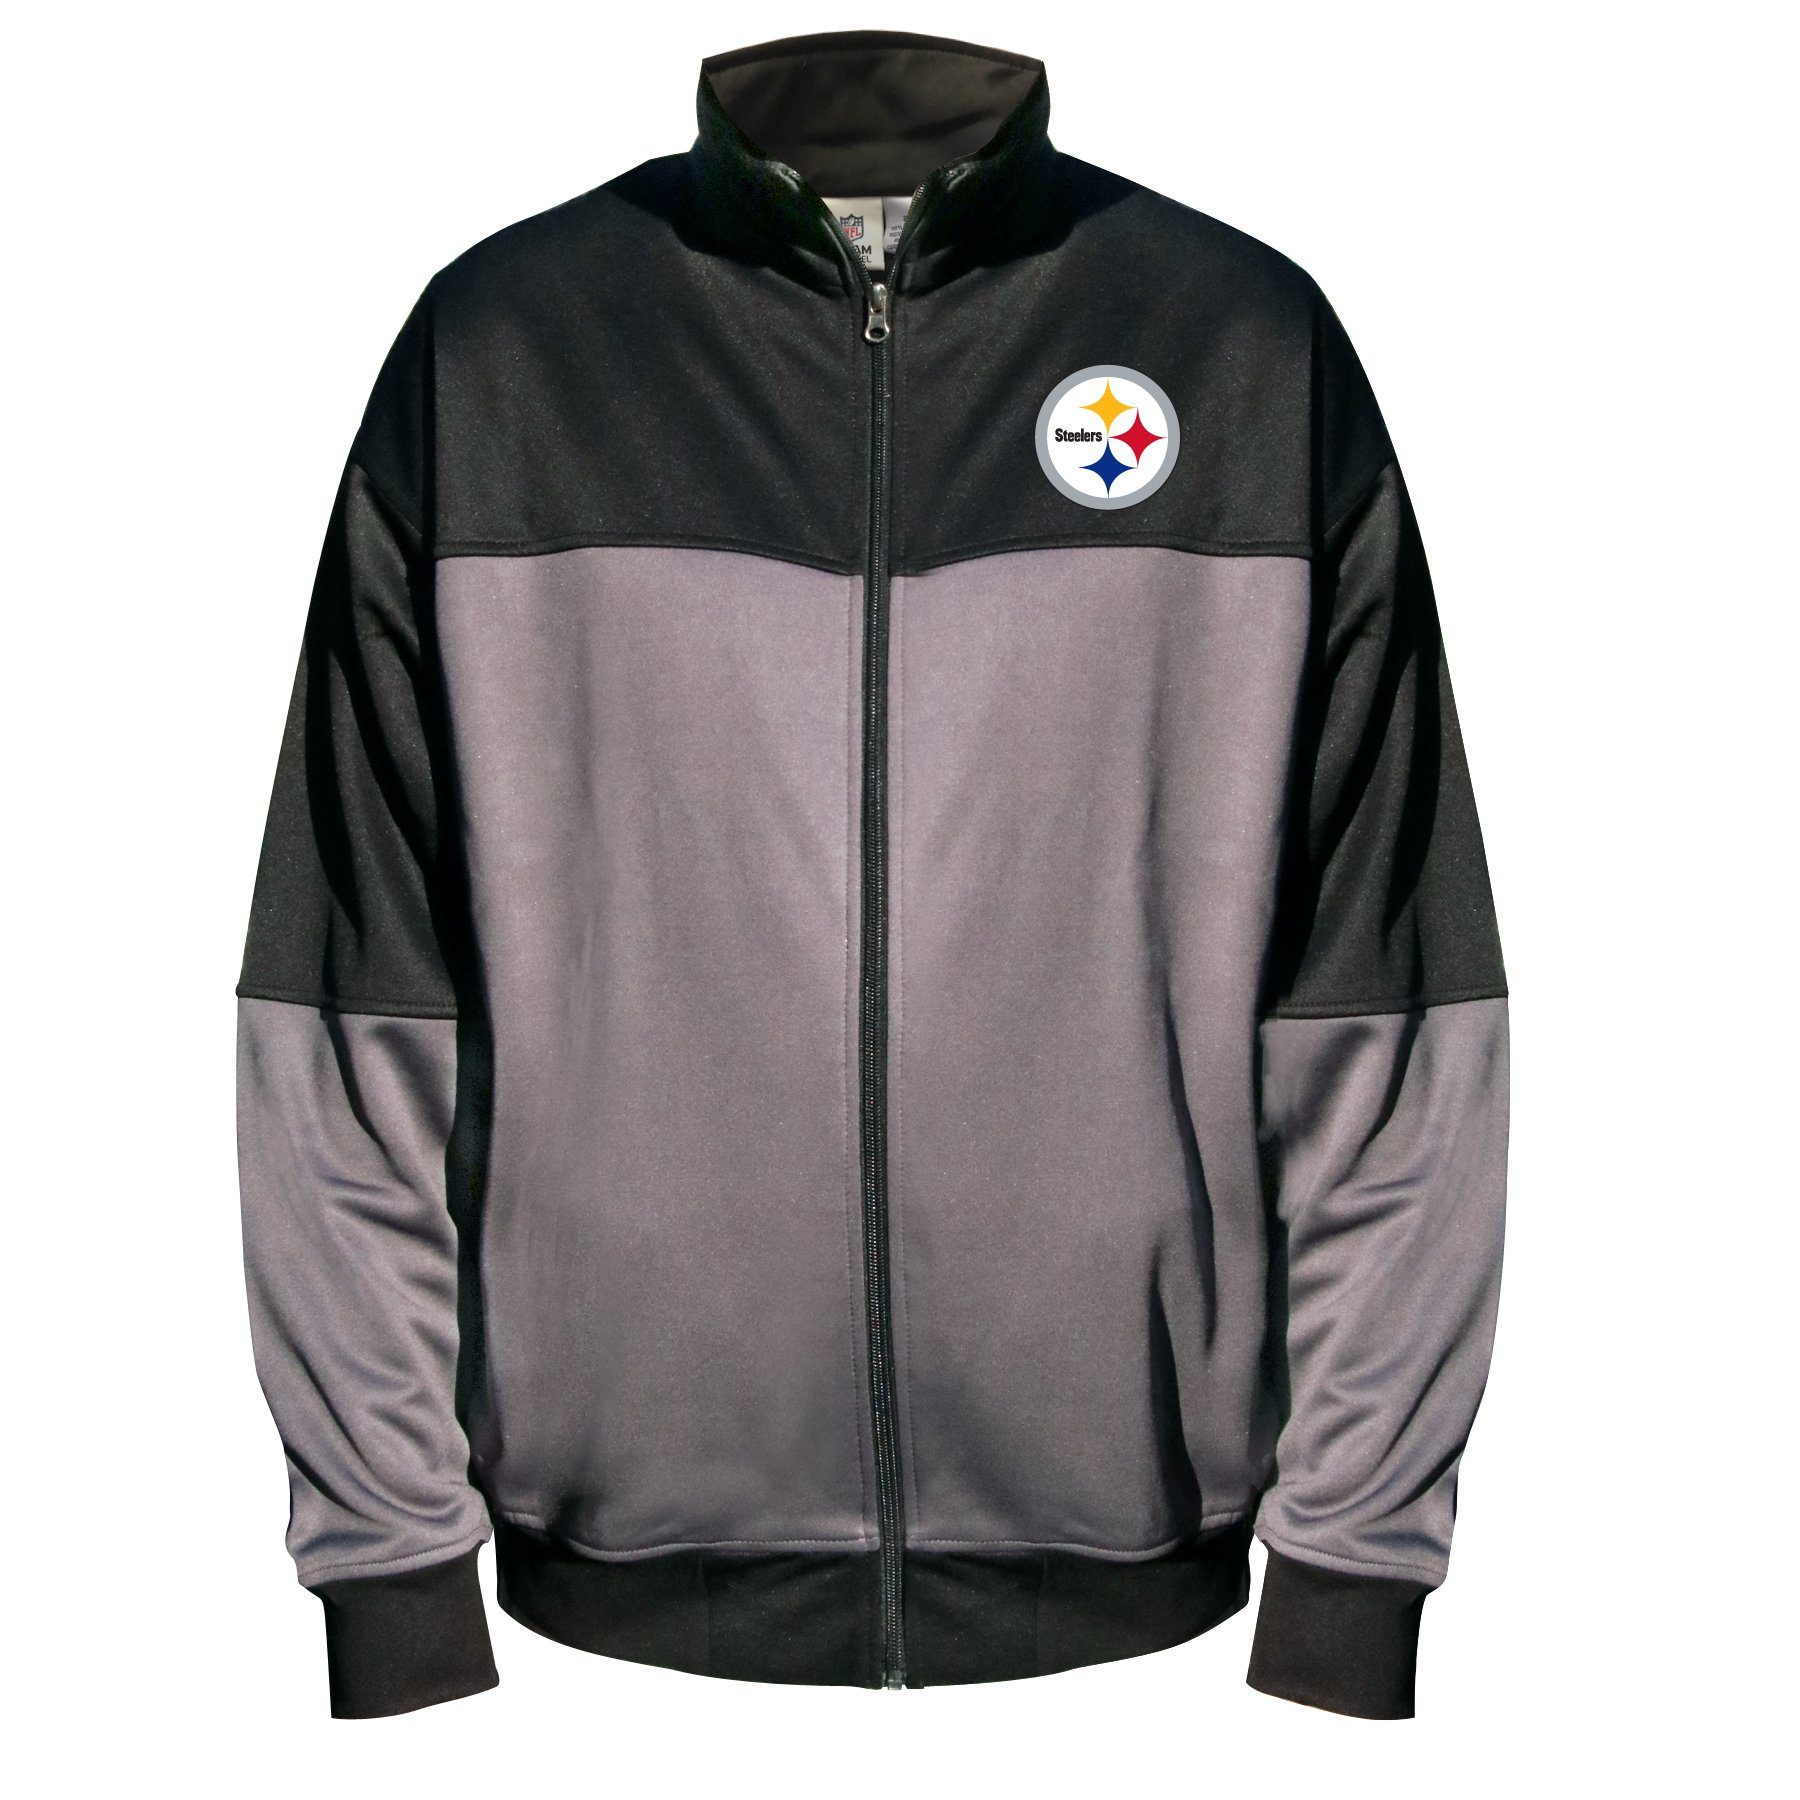 NFL Pittsburgh Steelers Unisex Poly Fleece Track Jacket, Charcoal/Black, 5X